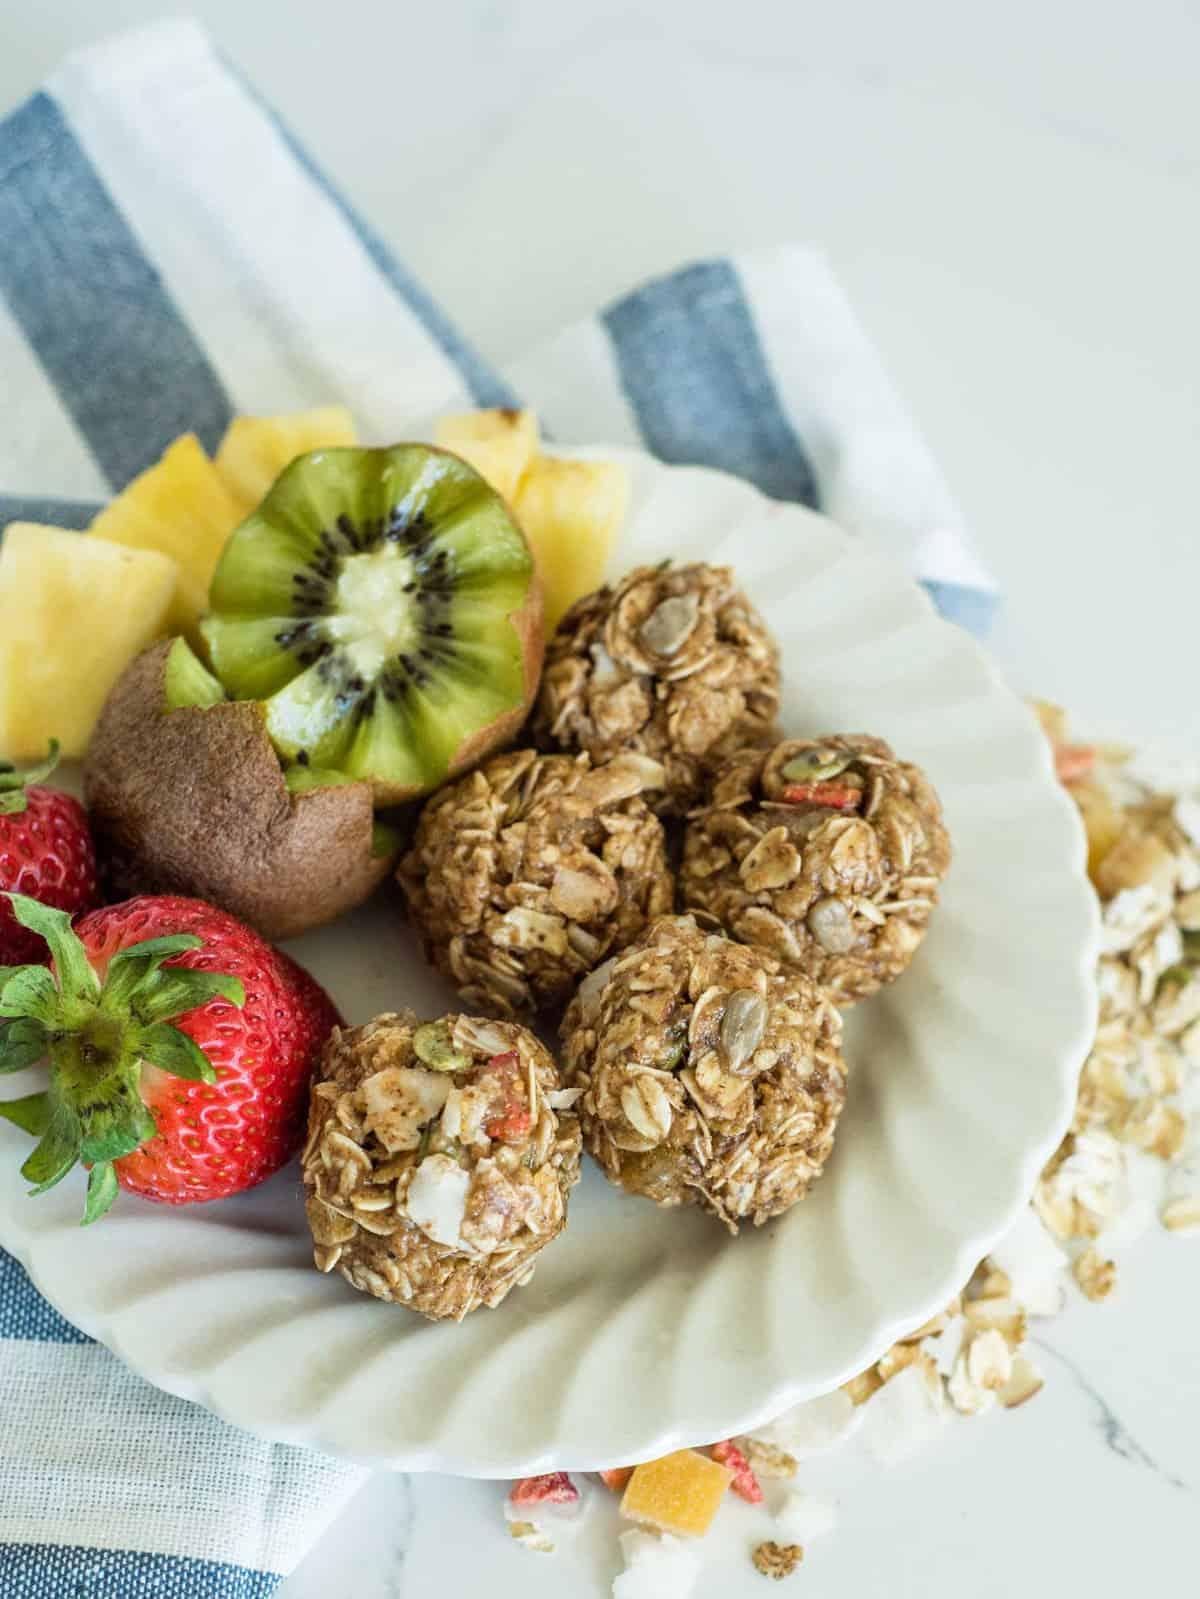 Image of No Bake Muesli Bites on a Breakfast Plate